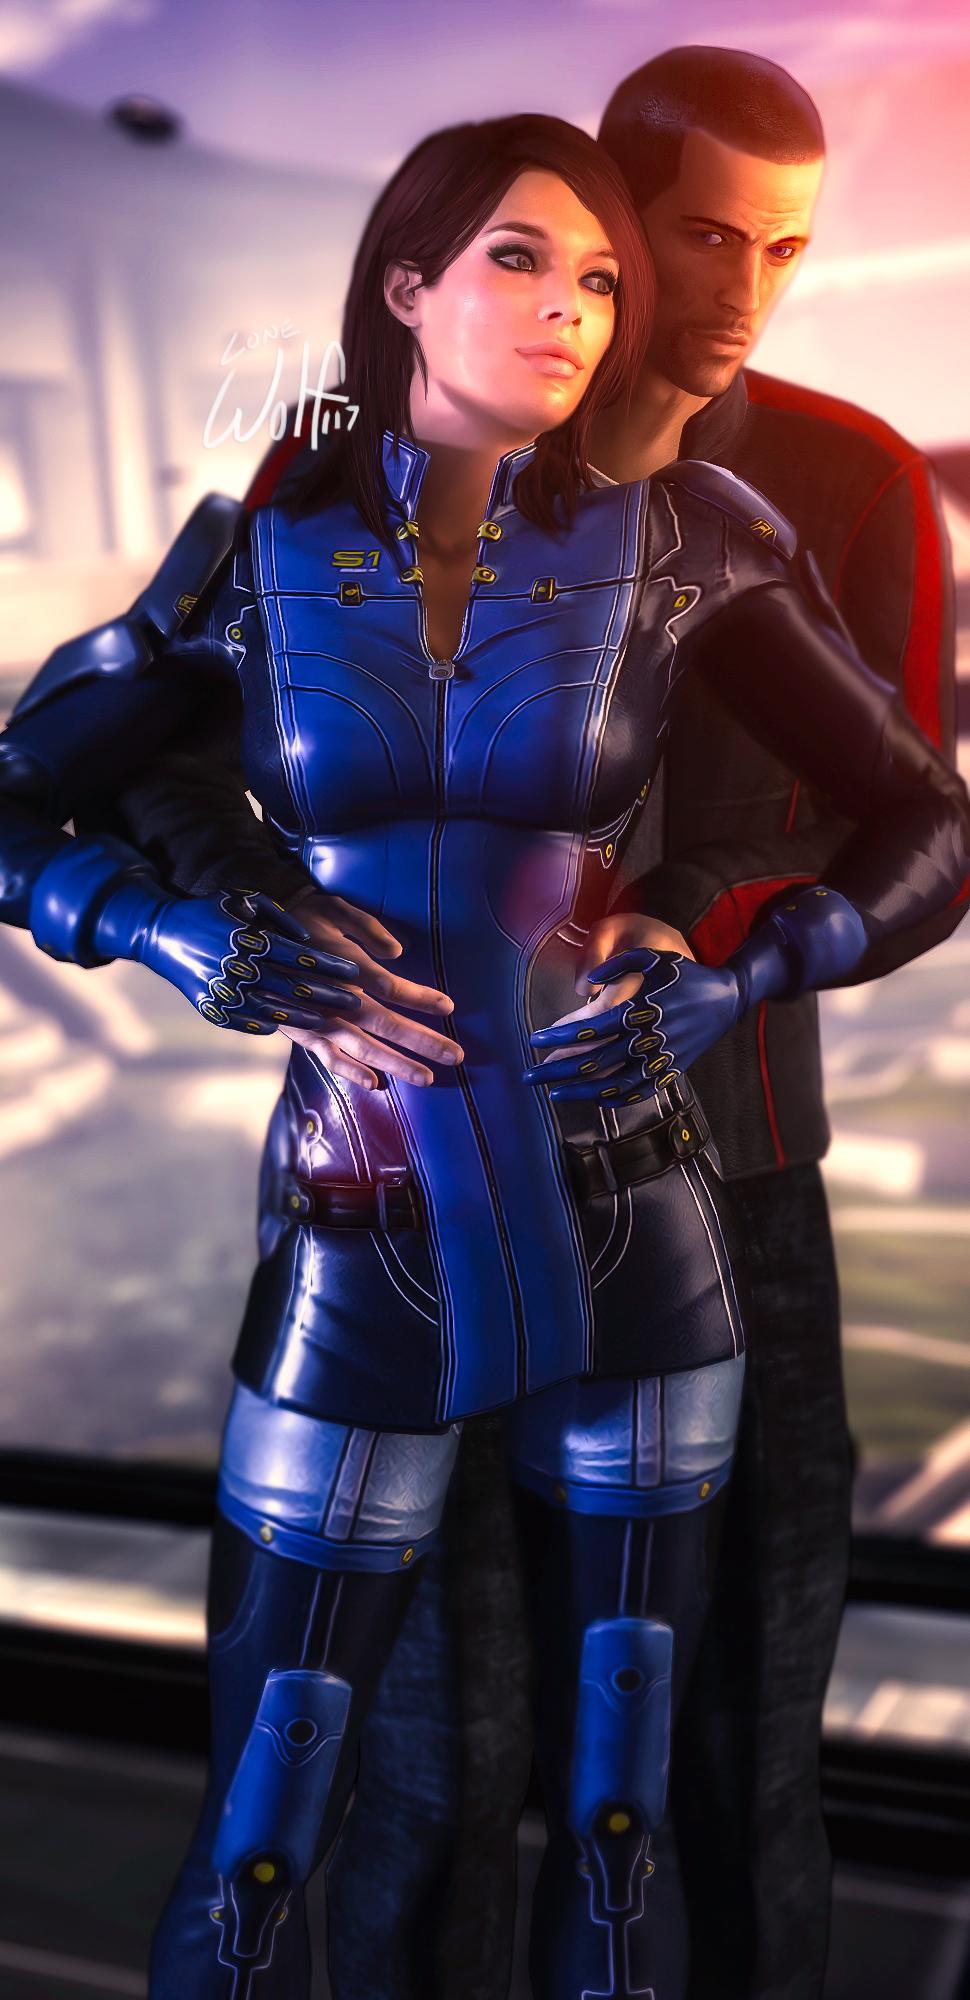 sa_edit_by_lonewolf117-d70gbs4.jpg - Mass Effect 3